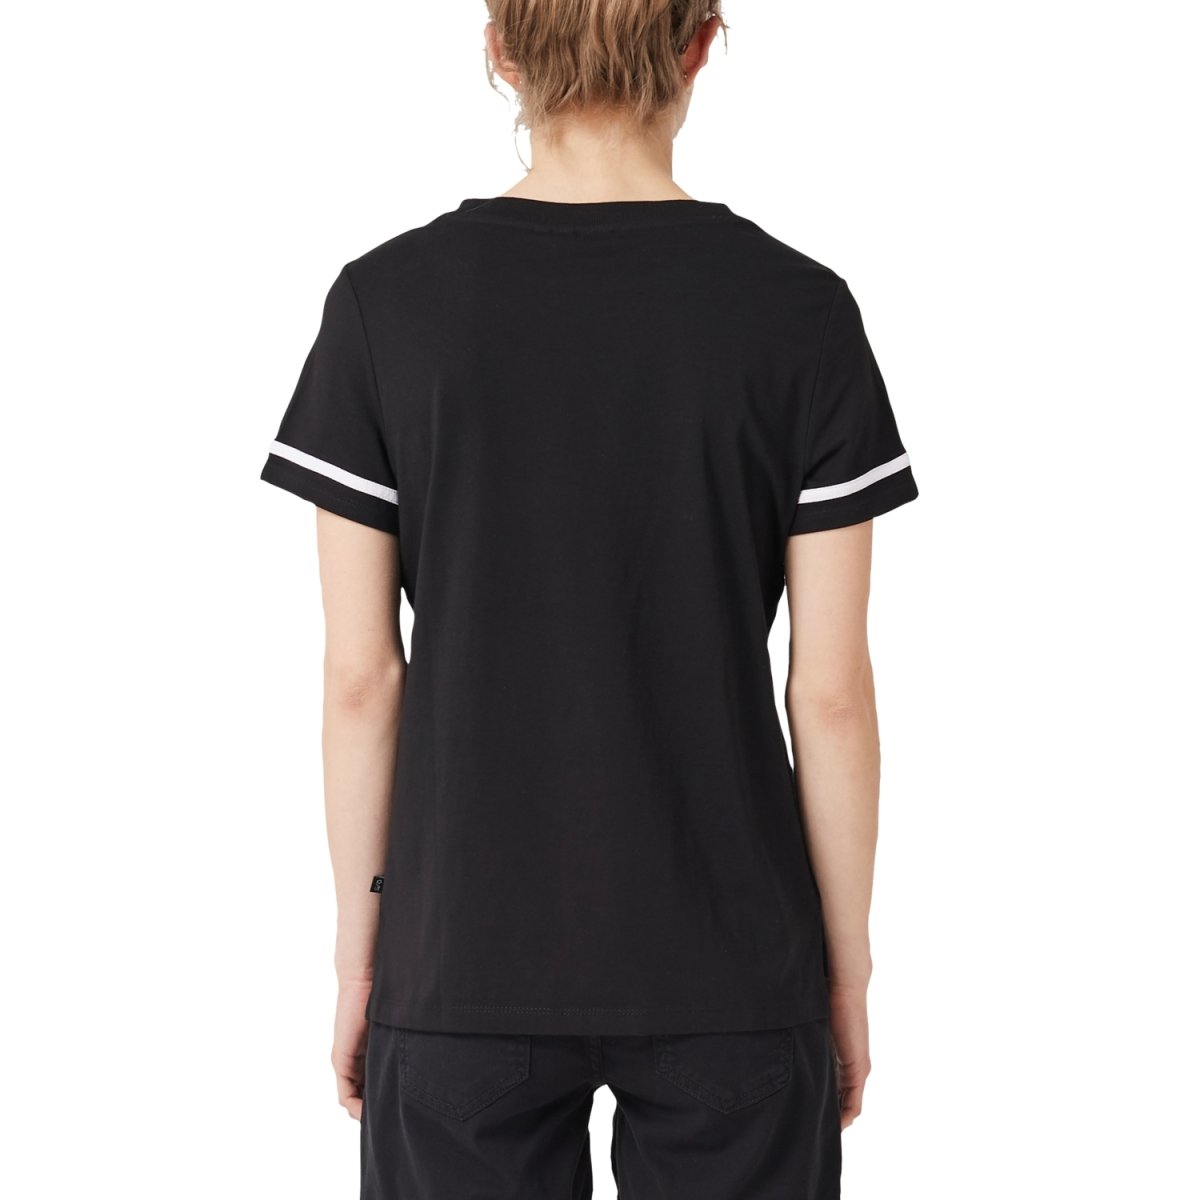 sportief shirt met glinsterende tekst 41905325284 q/s designed by t-shirt 99d0